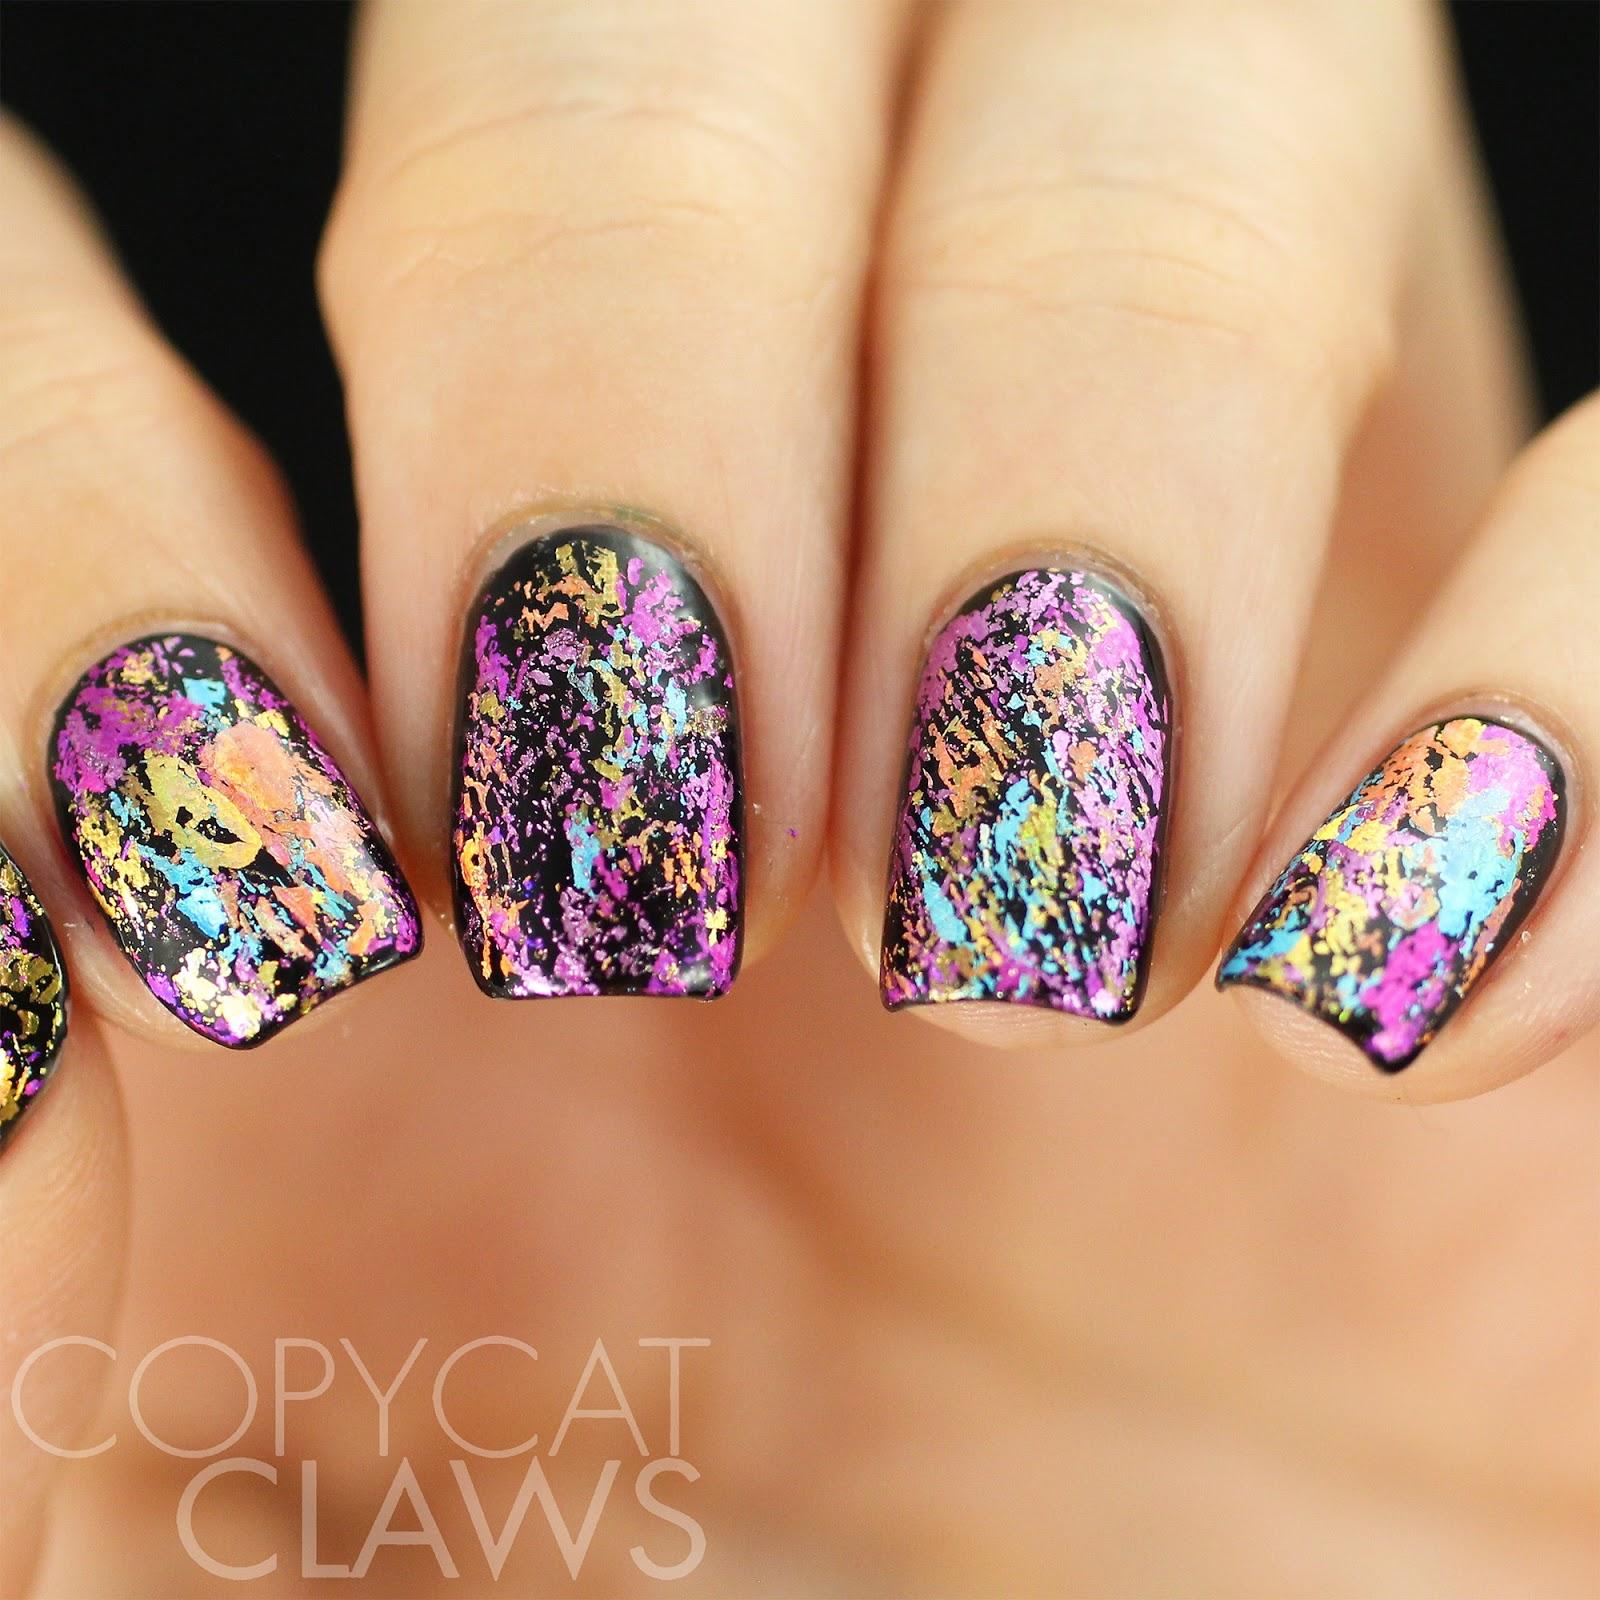 Copycat claws 26 great nail art ideas black base - Foil nail art ...